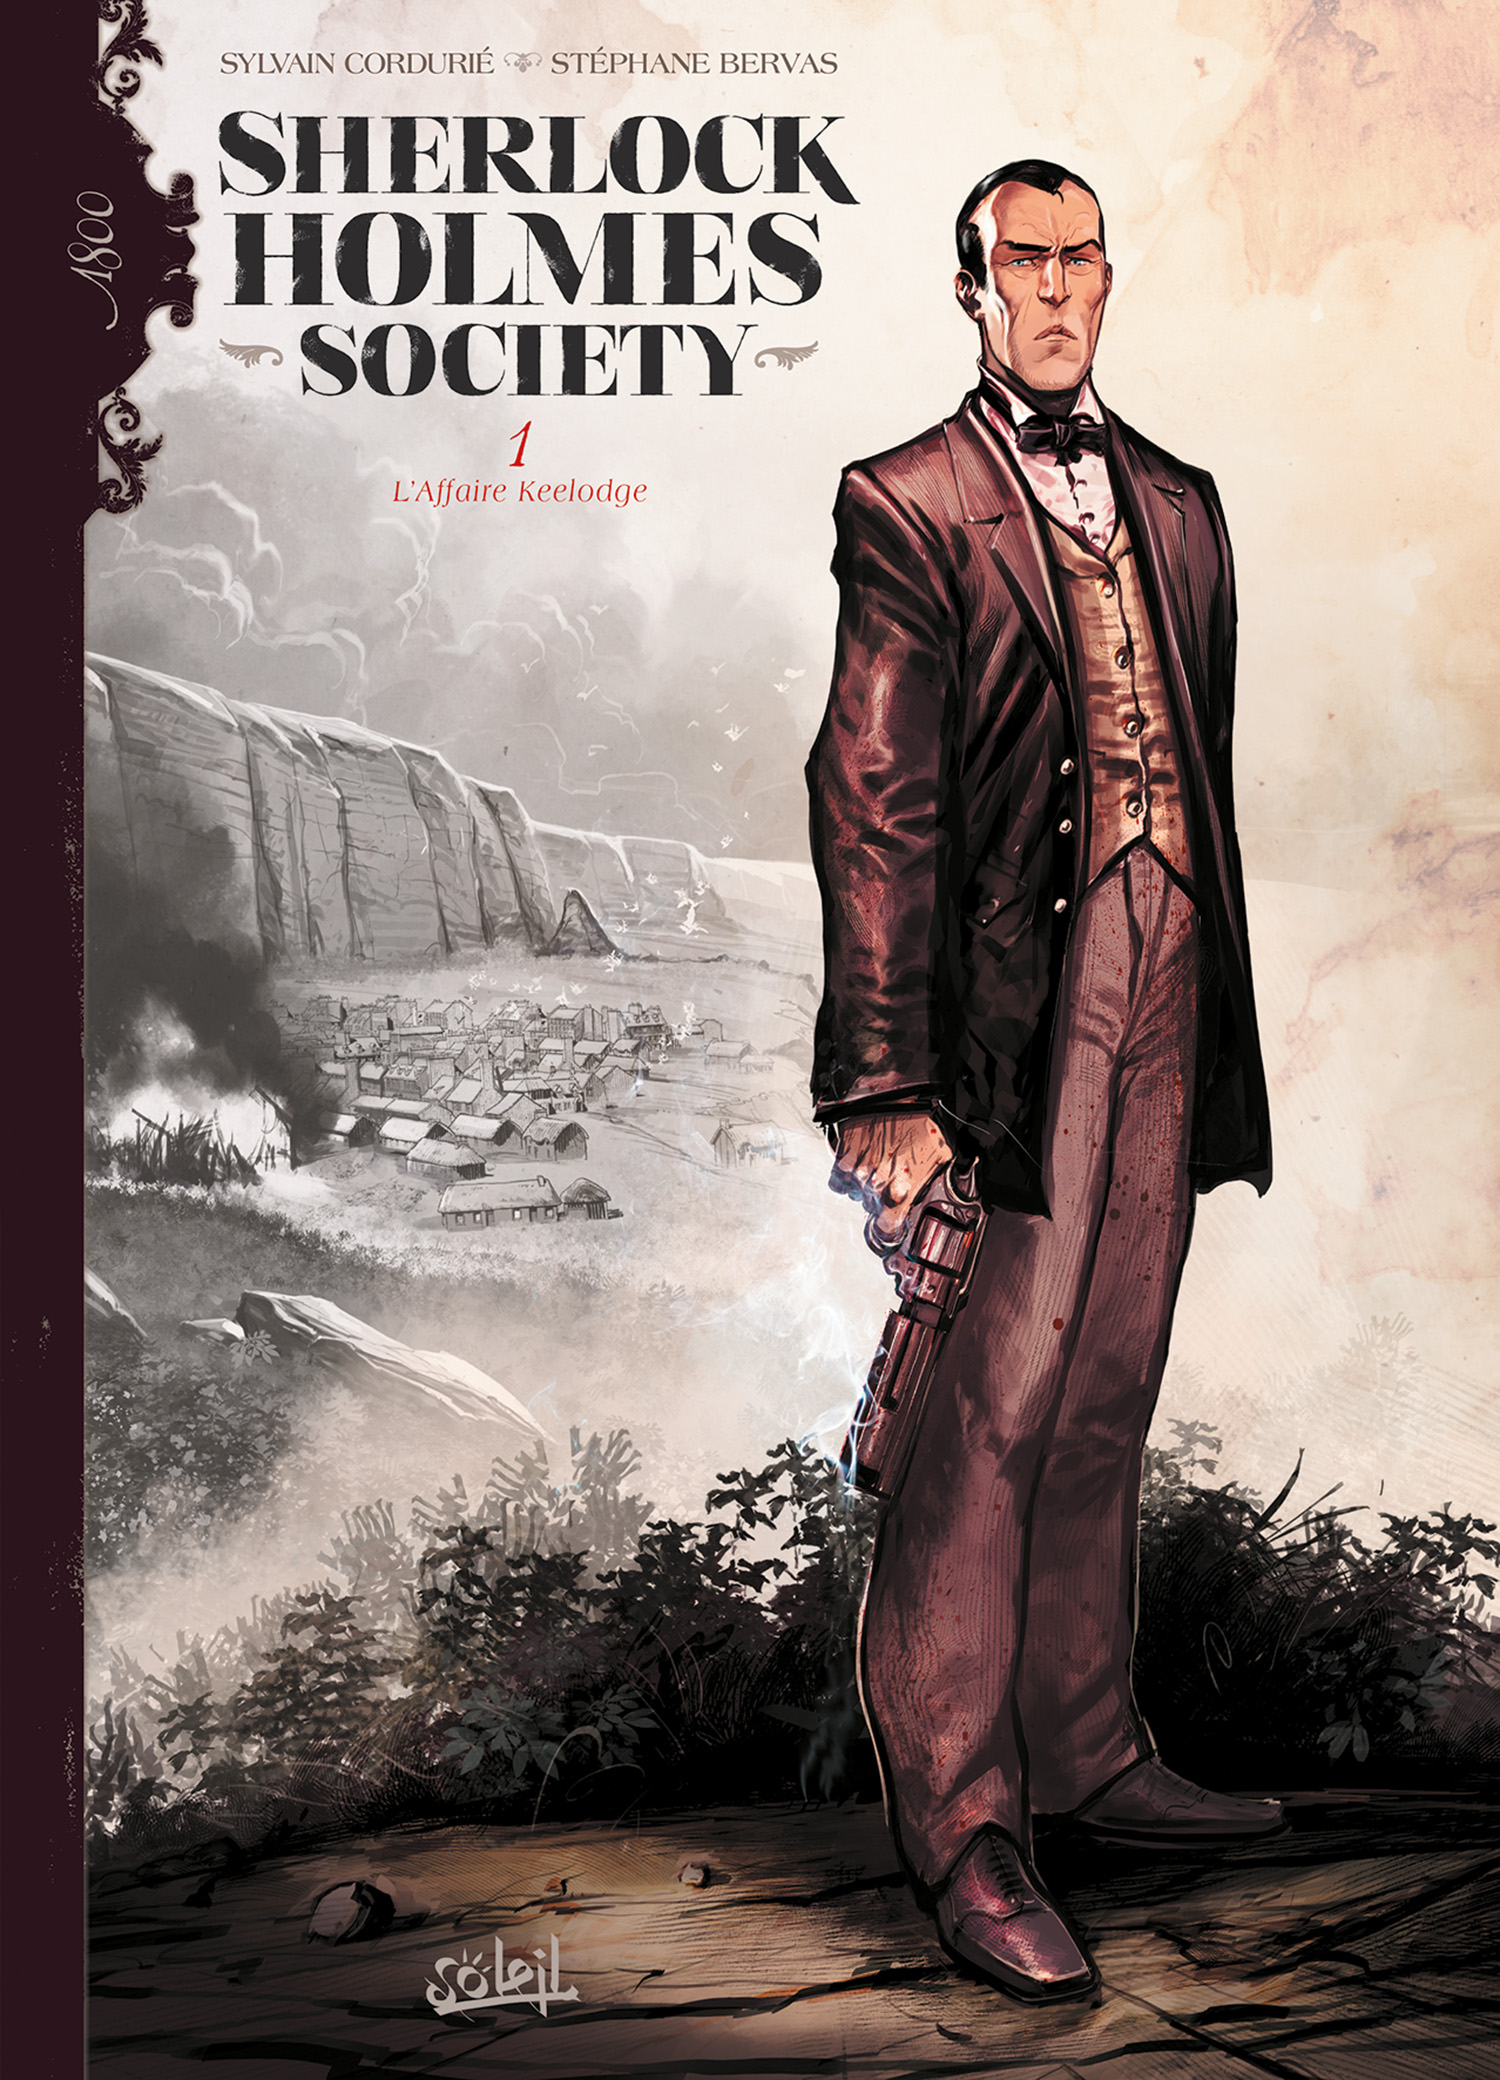 On a lu… Sherlock Holmes Society de Sylvain Corduré et Stéphane Bervas